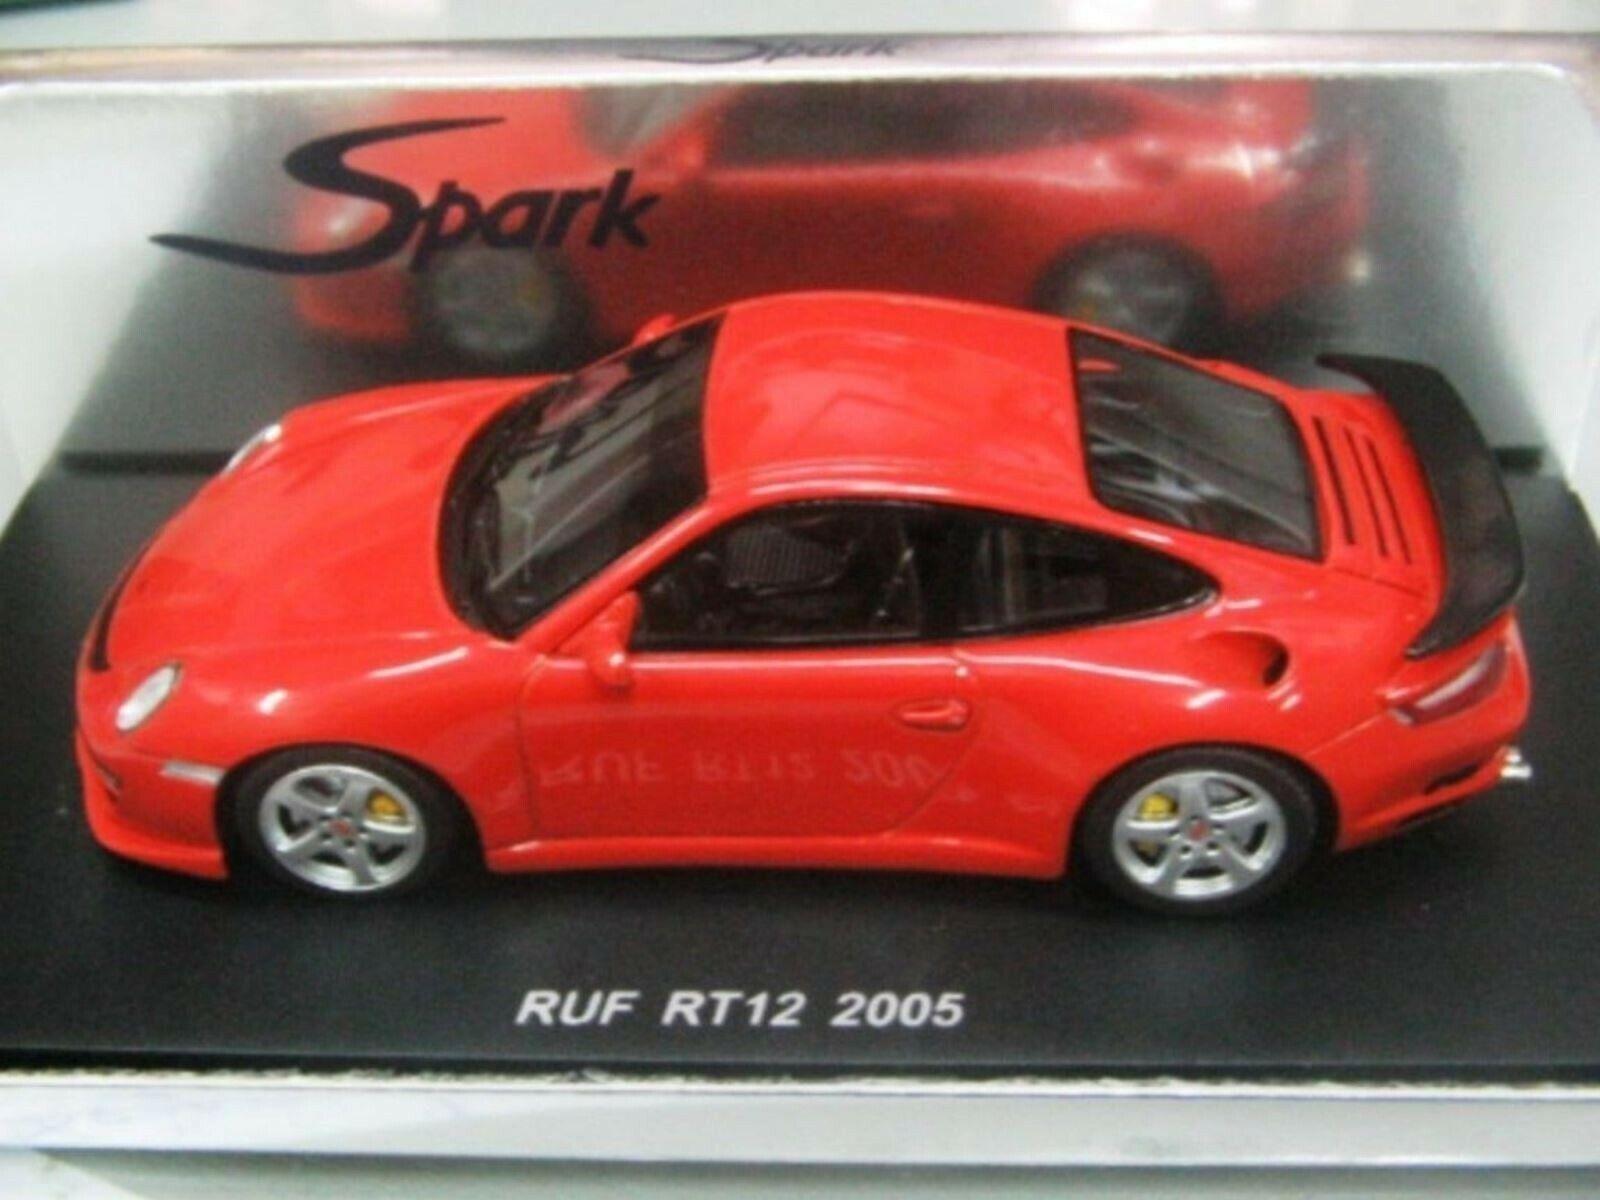 Wow extrêmement rare Porsche 997 911 2005 TURBO 3.8 RUF RT12 Orange 1 43 Spark-PMA